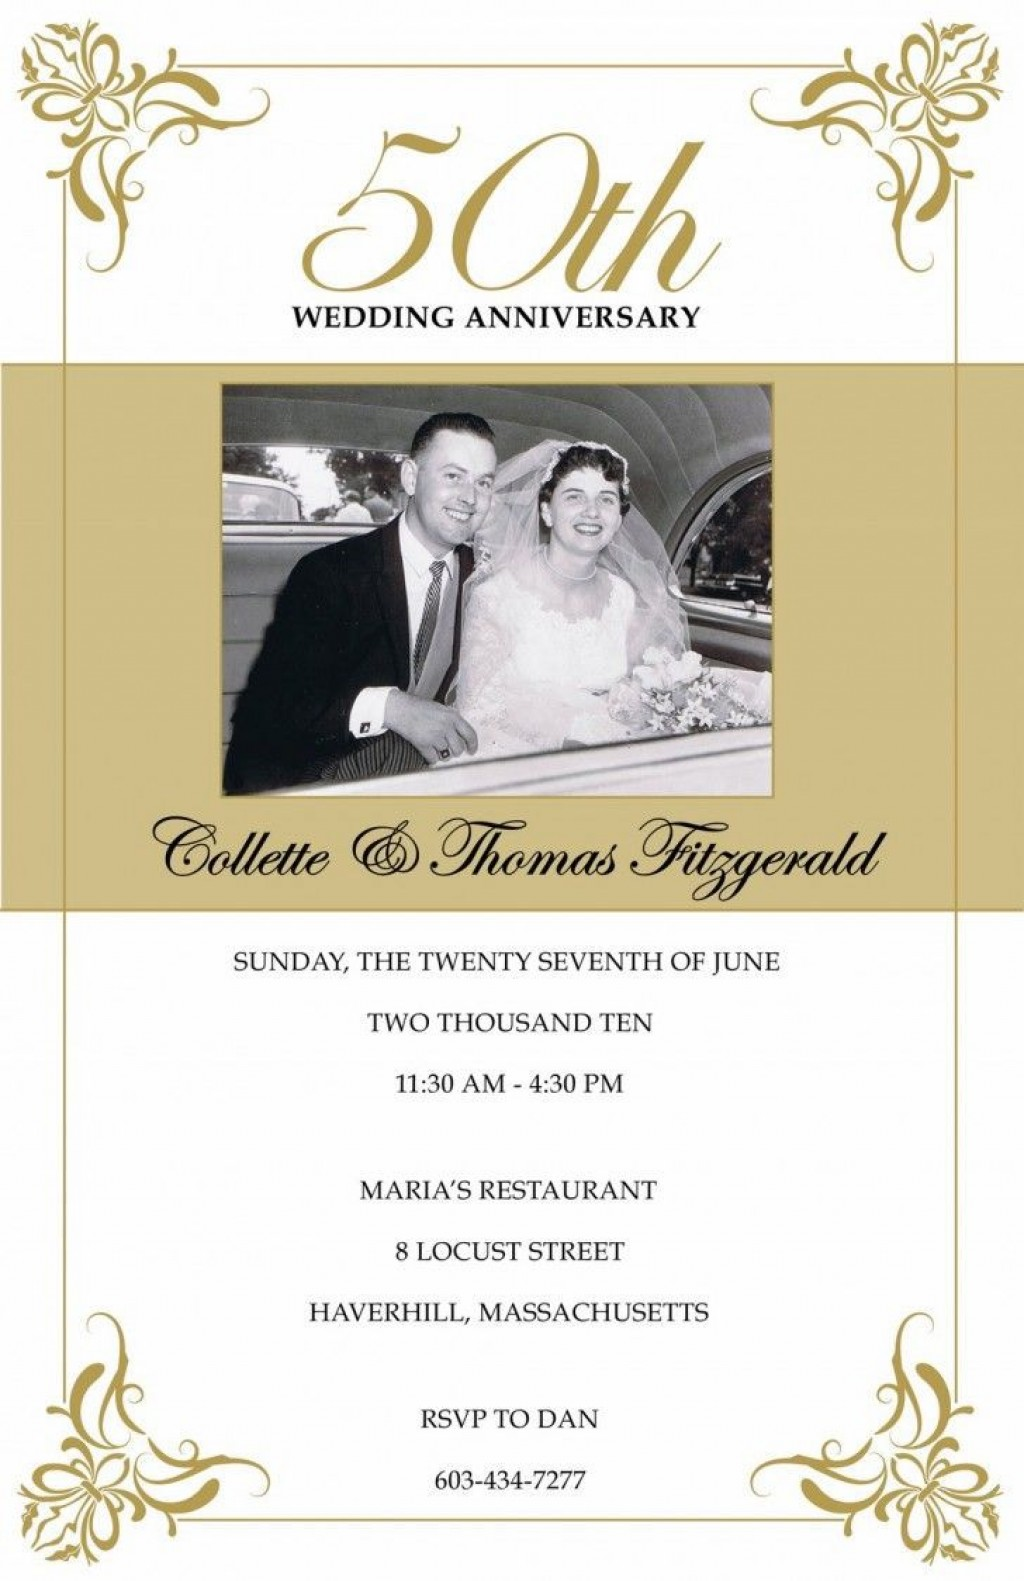 008 Wonderful 50th Wedding Anniversary Party Invitation Template Design  Templates FreeLarge